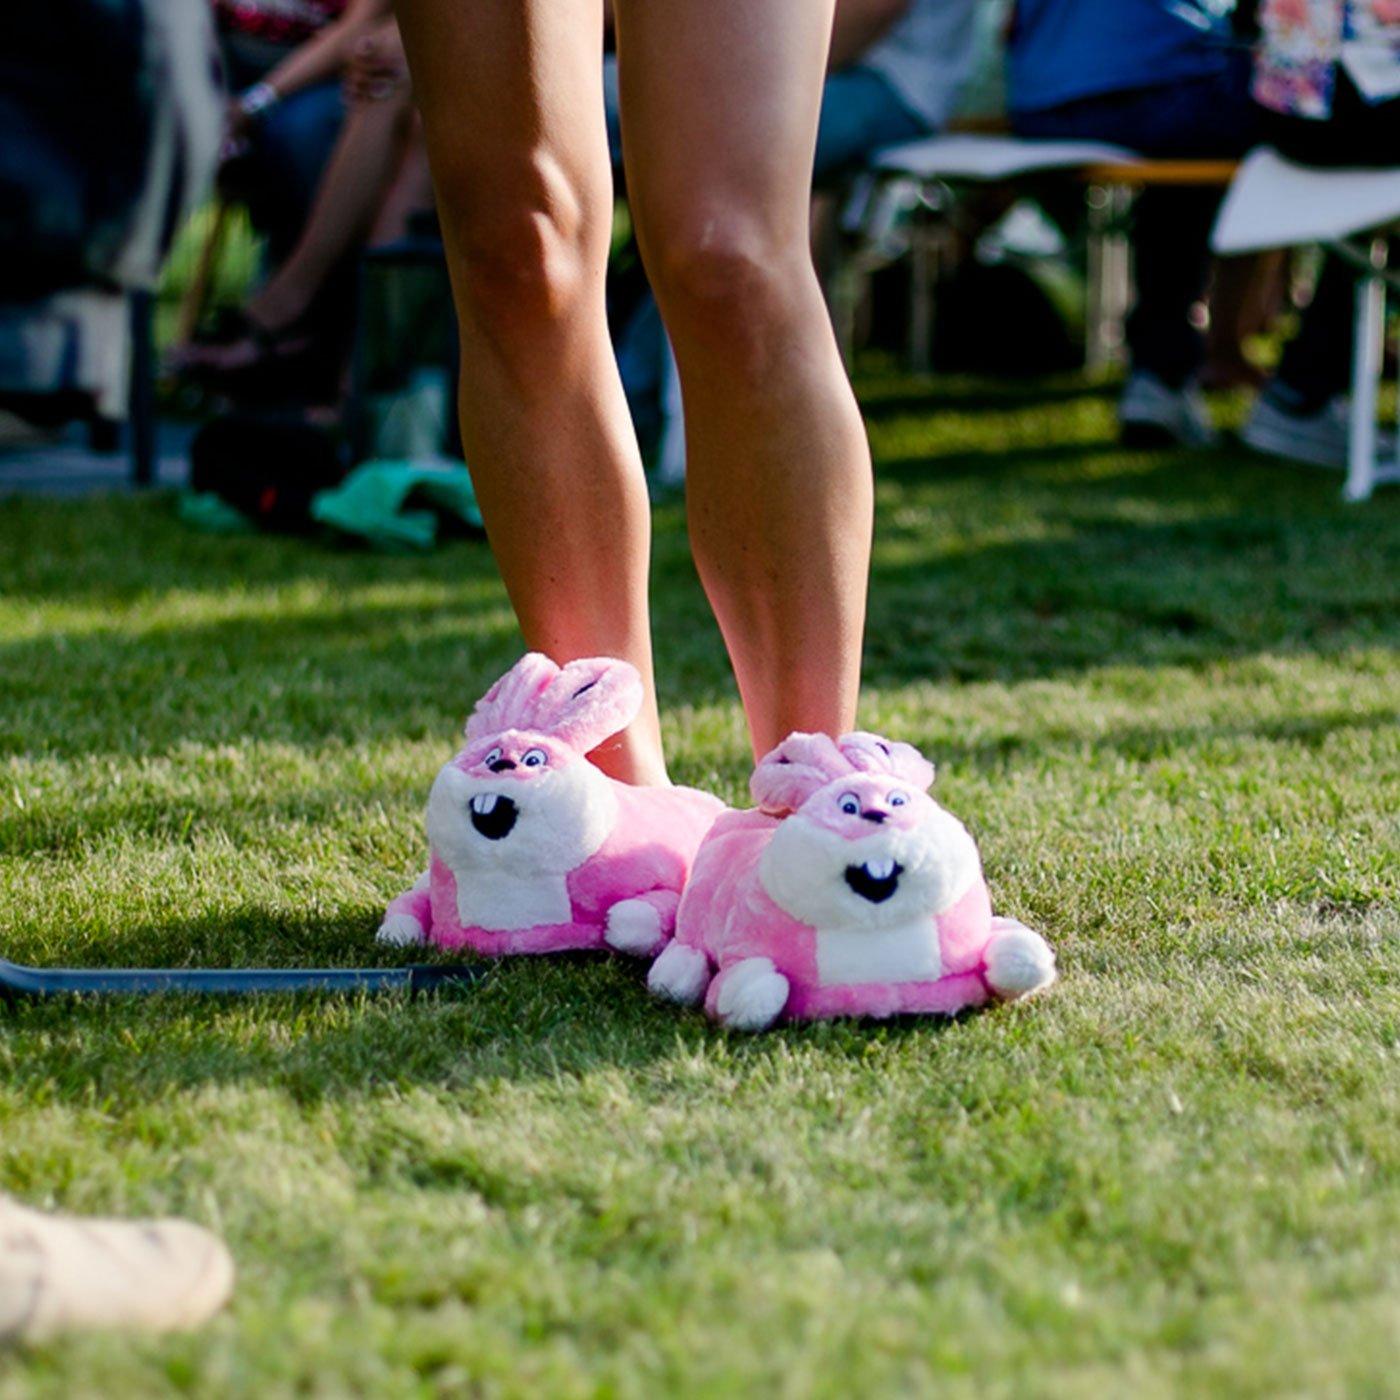 funslippers Unisex Plush Indoor Novelty Slippers Animal Bunny Pink